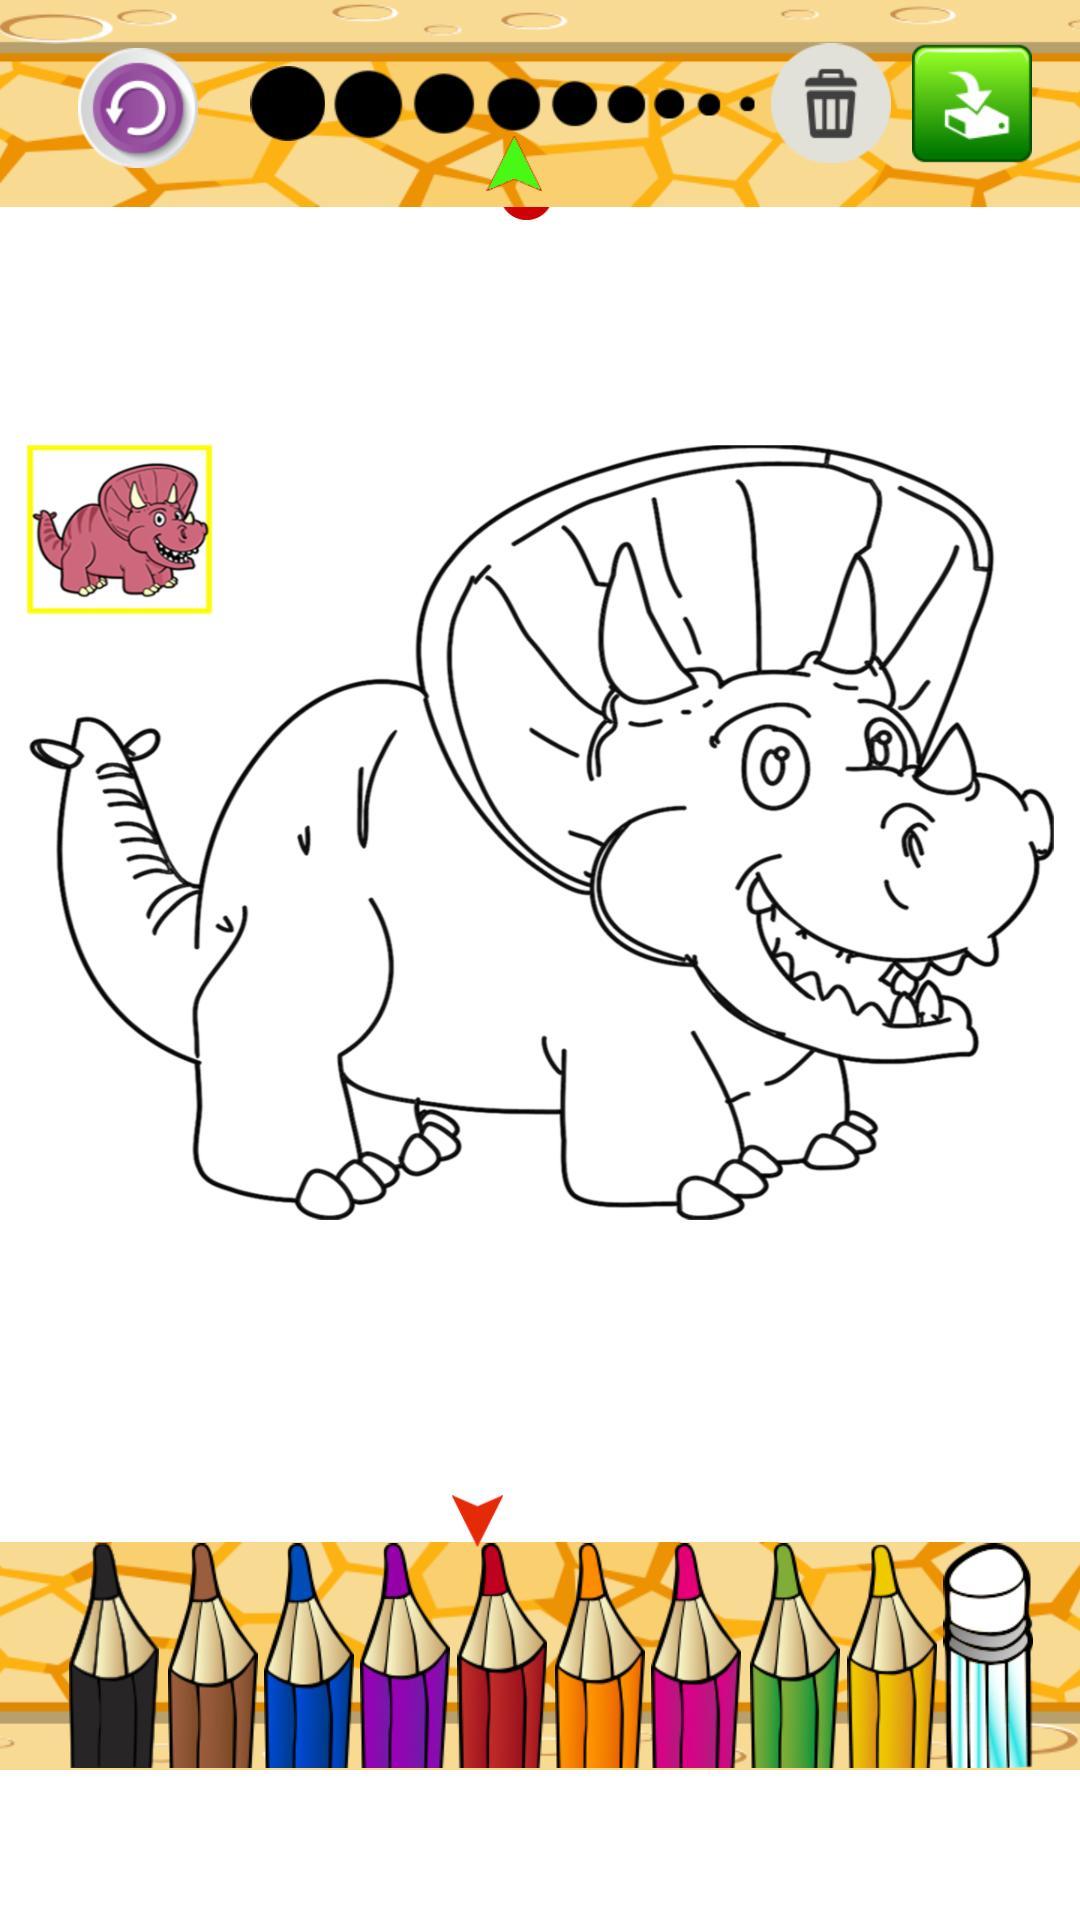 Kumpulan gambar untuk Belajar mewarnai: Gambar Kartun ...